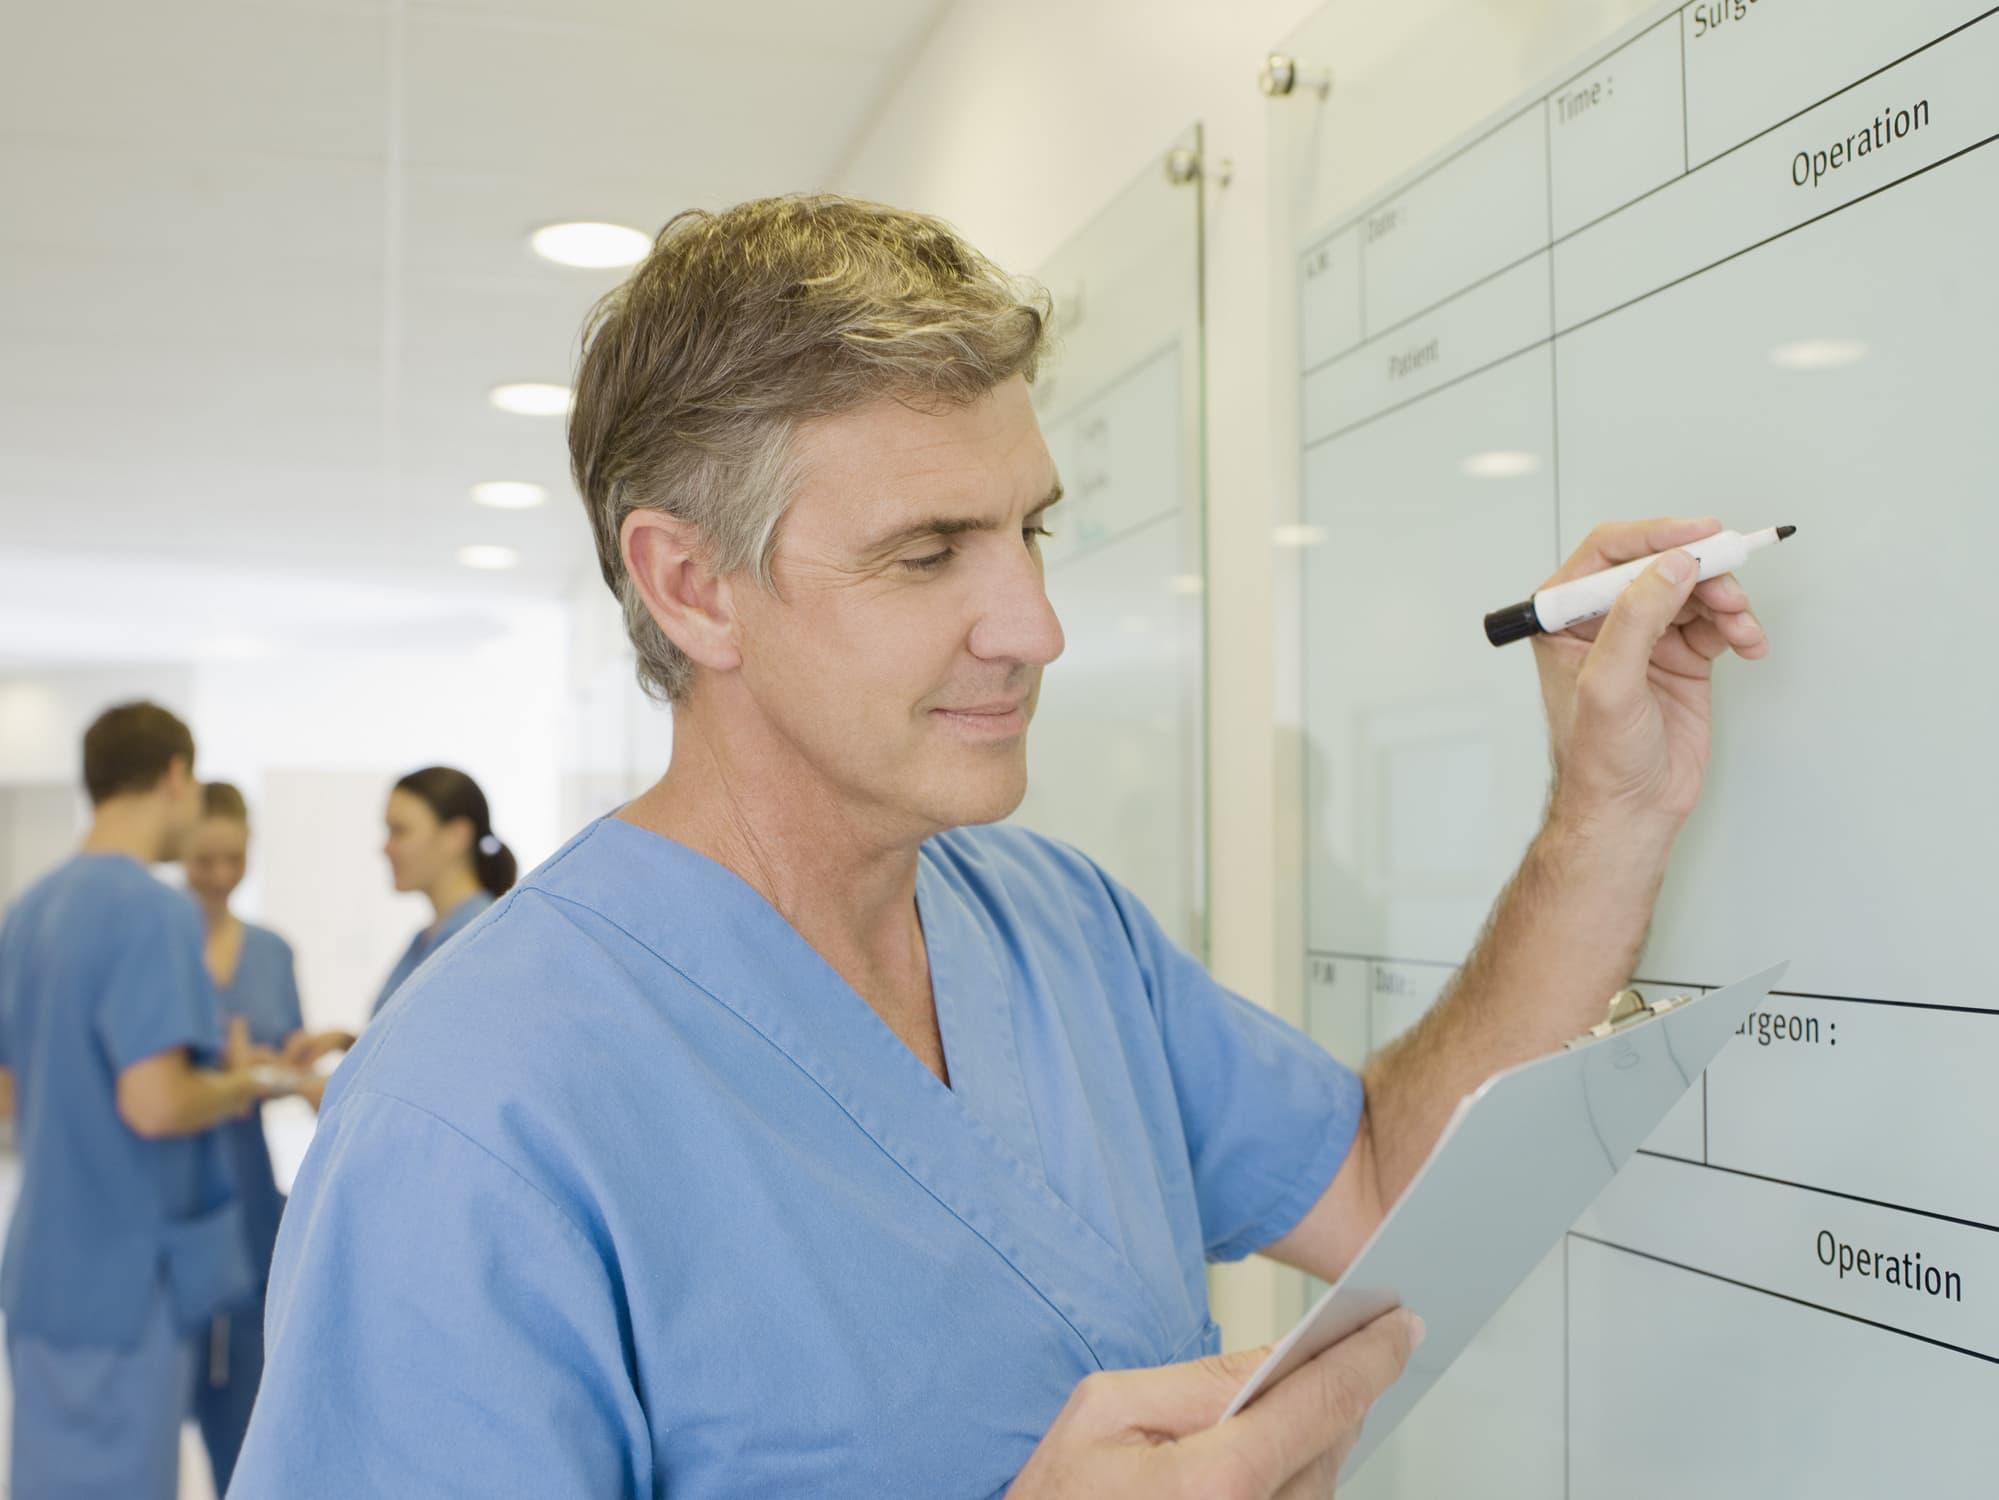 Salary and Career Outlook for Nurse Executives